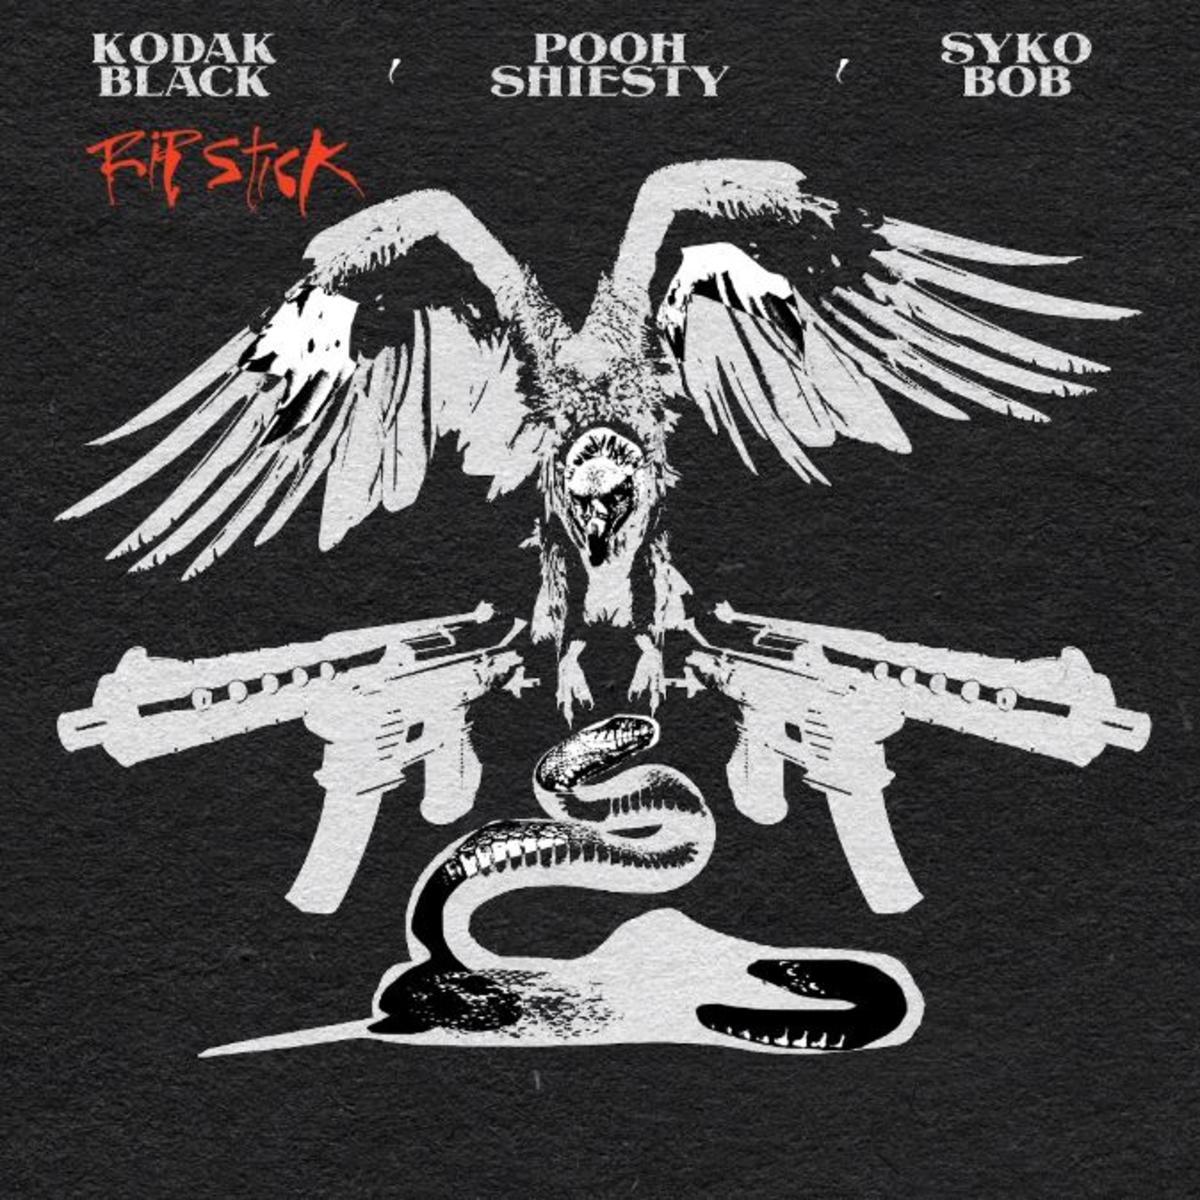 DOWNLOAD MP3: Kodak Black Ft. Sykobob & Pooh Shiesty – Rip Stick